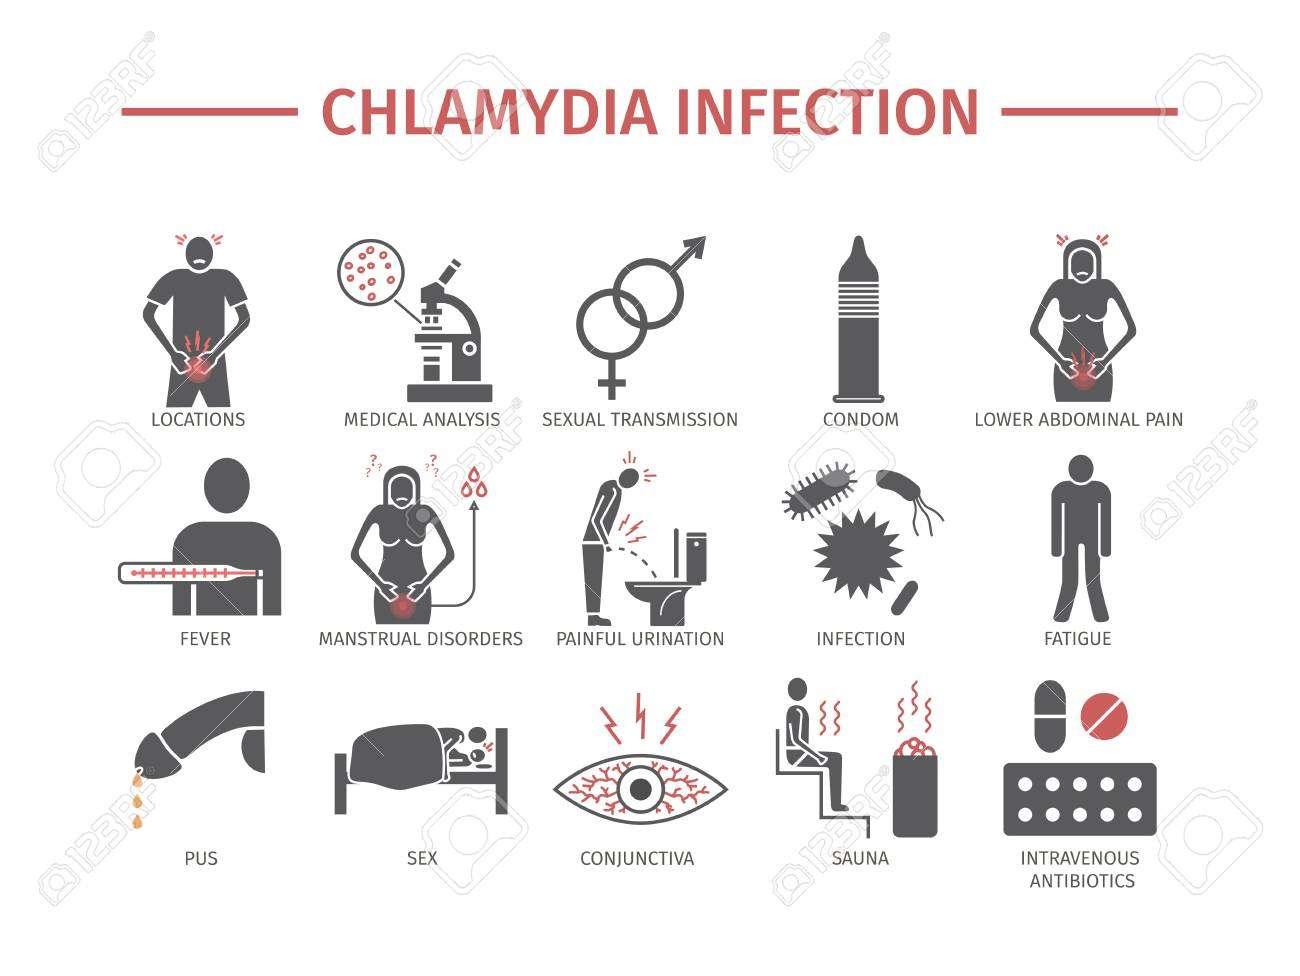 95301082 chlamydia infection flat icon vector signs for web graphics  - کلامیدیا؛ یکی از شایع ترین بیماری های جنسی